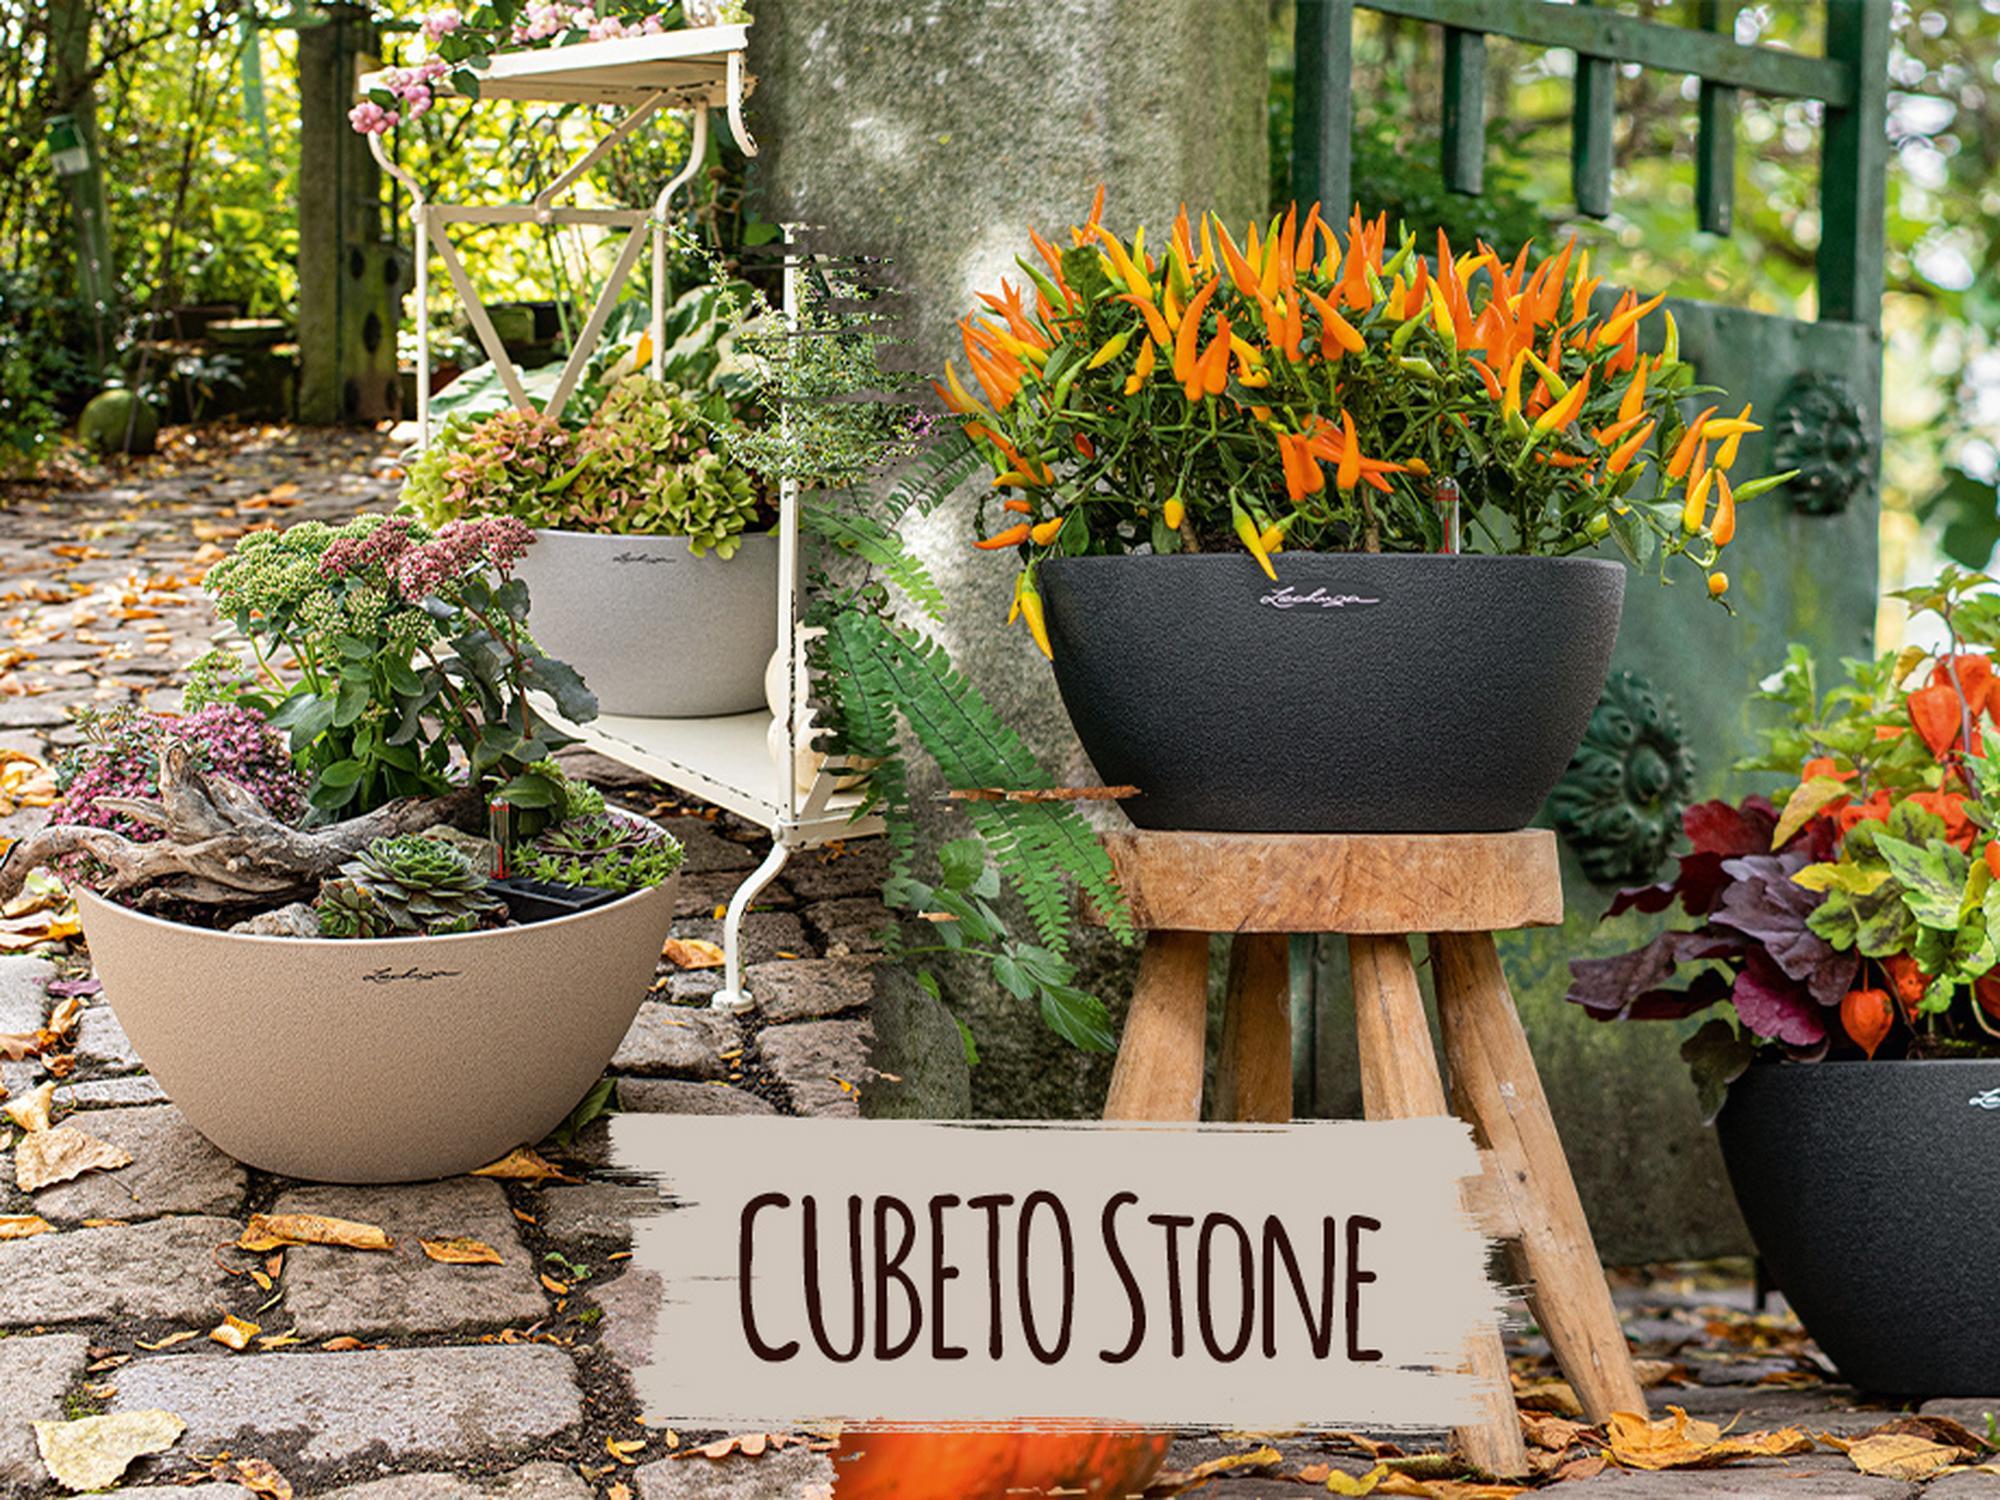 CUBETO Stone en promoción 10% de descuento